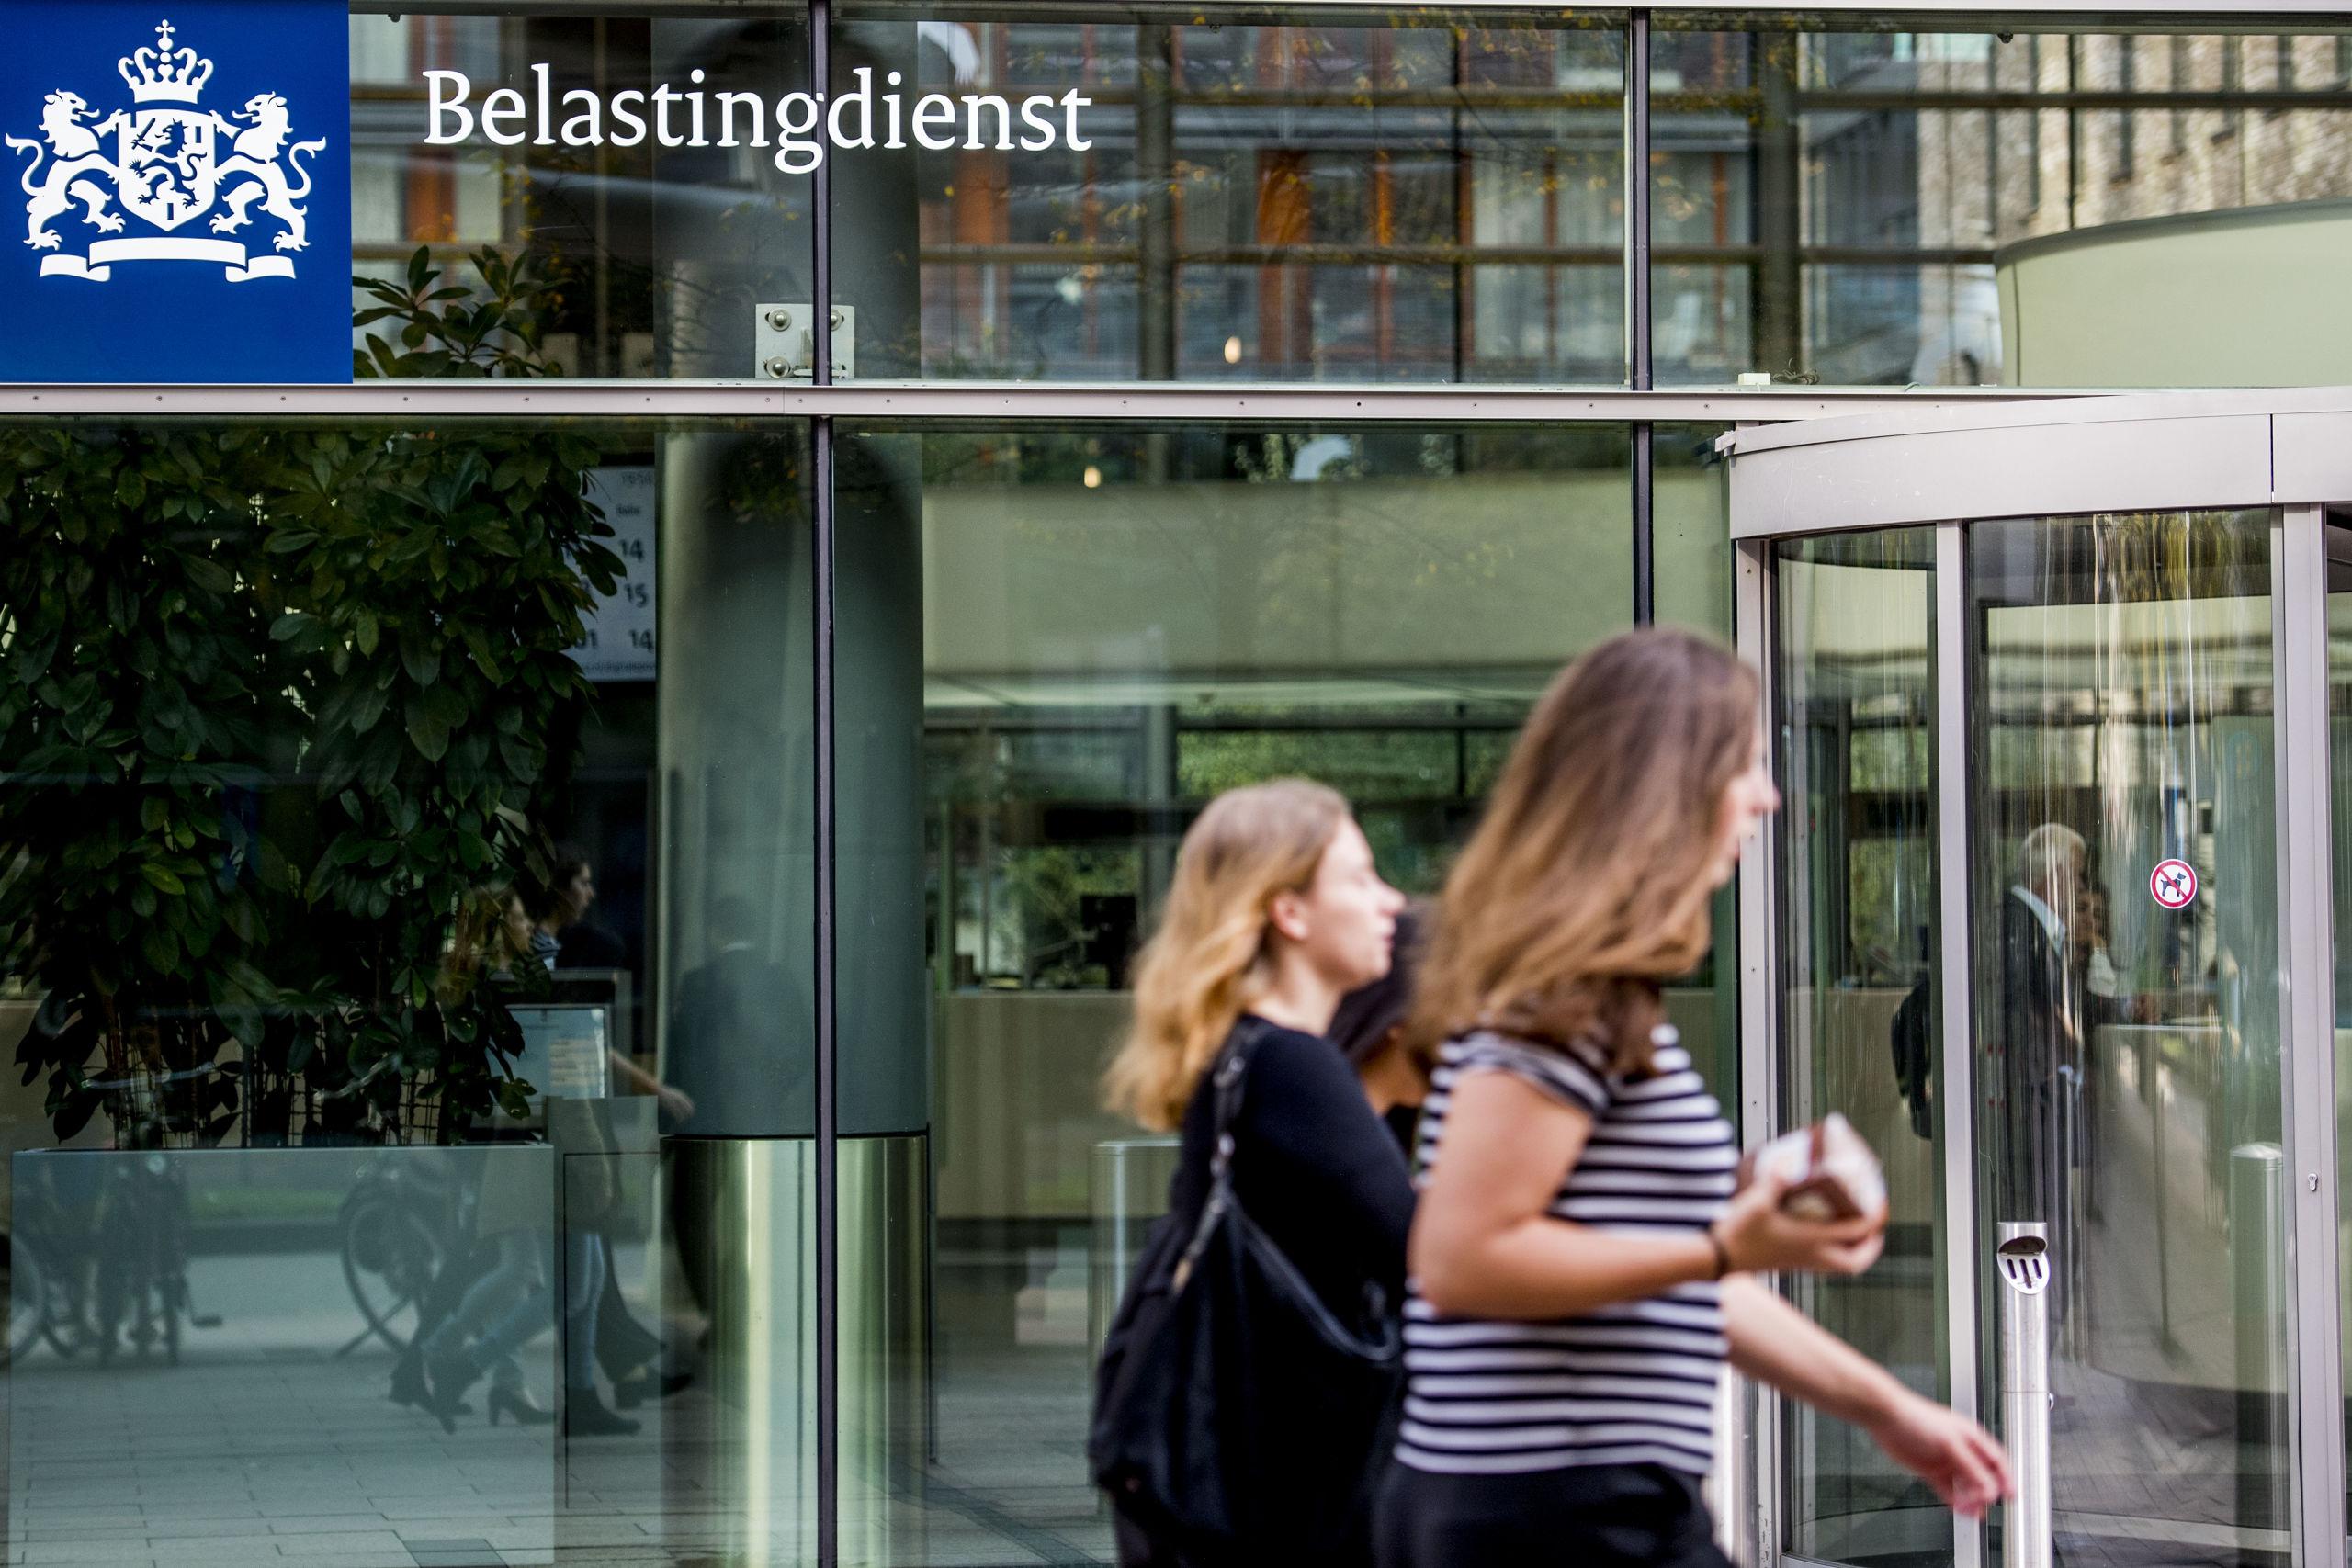 Belastingdienst Kantoor Rotterdam : Belastingdienst kantoor rotterdam dana plato body huis ontwerp